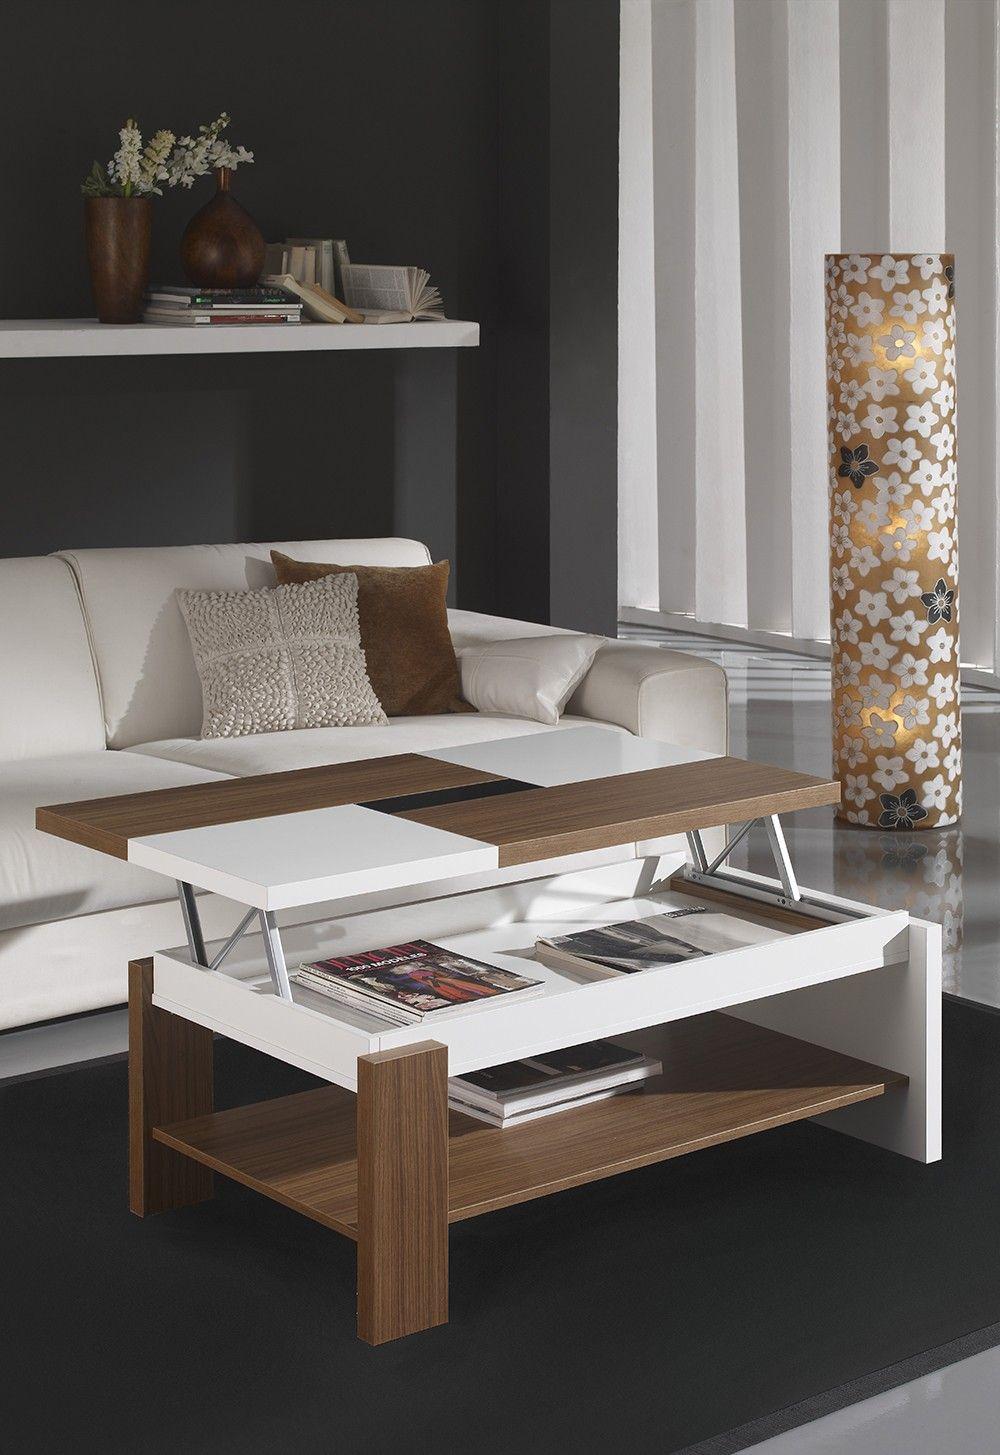 Table Basse Relevable Contemporaine Fabio Coloris Noyer Blanc Ceiling Design Living Room Center Table Living Room Refurbished Table